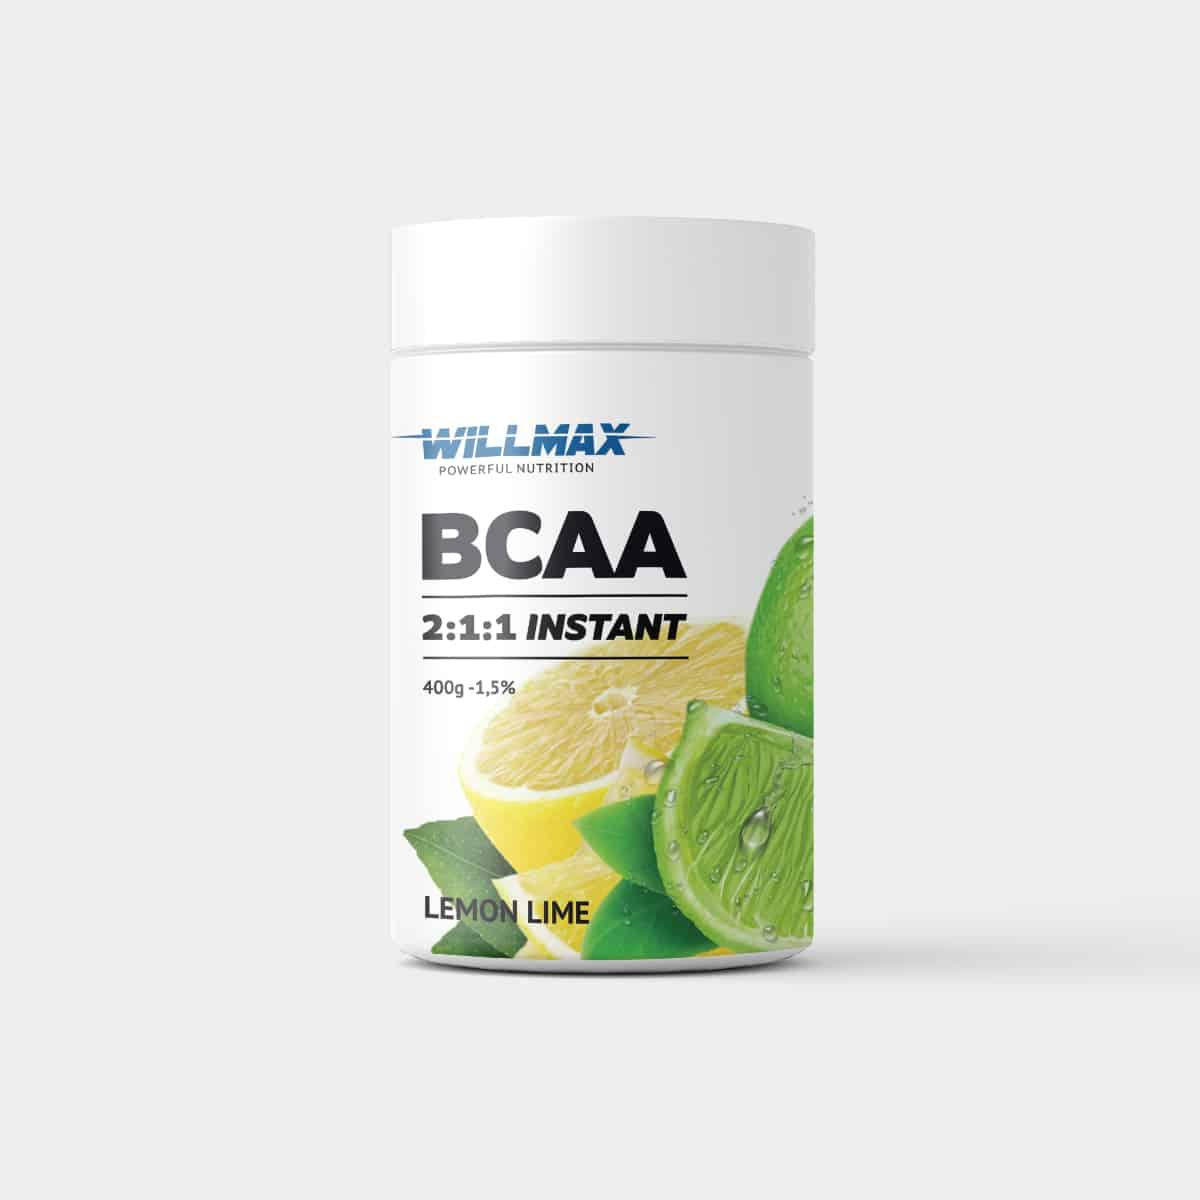 Аминокислоты Willmax BCAA 2:1:1 400г. ЛИМОН-ЛАЙМ